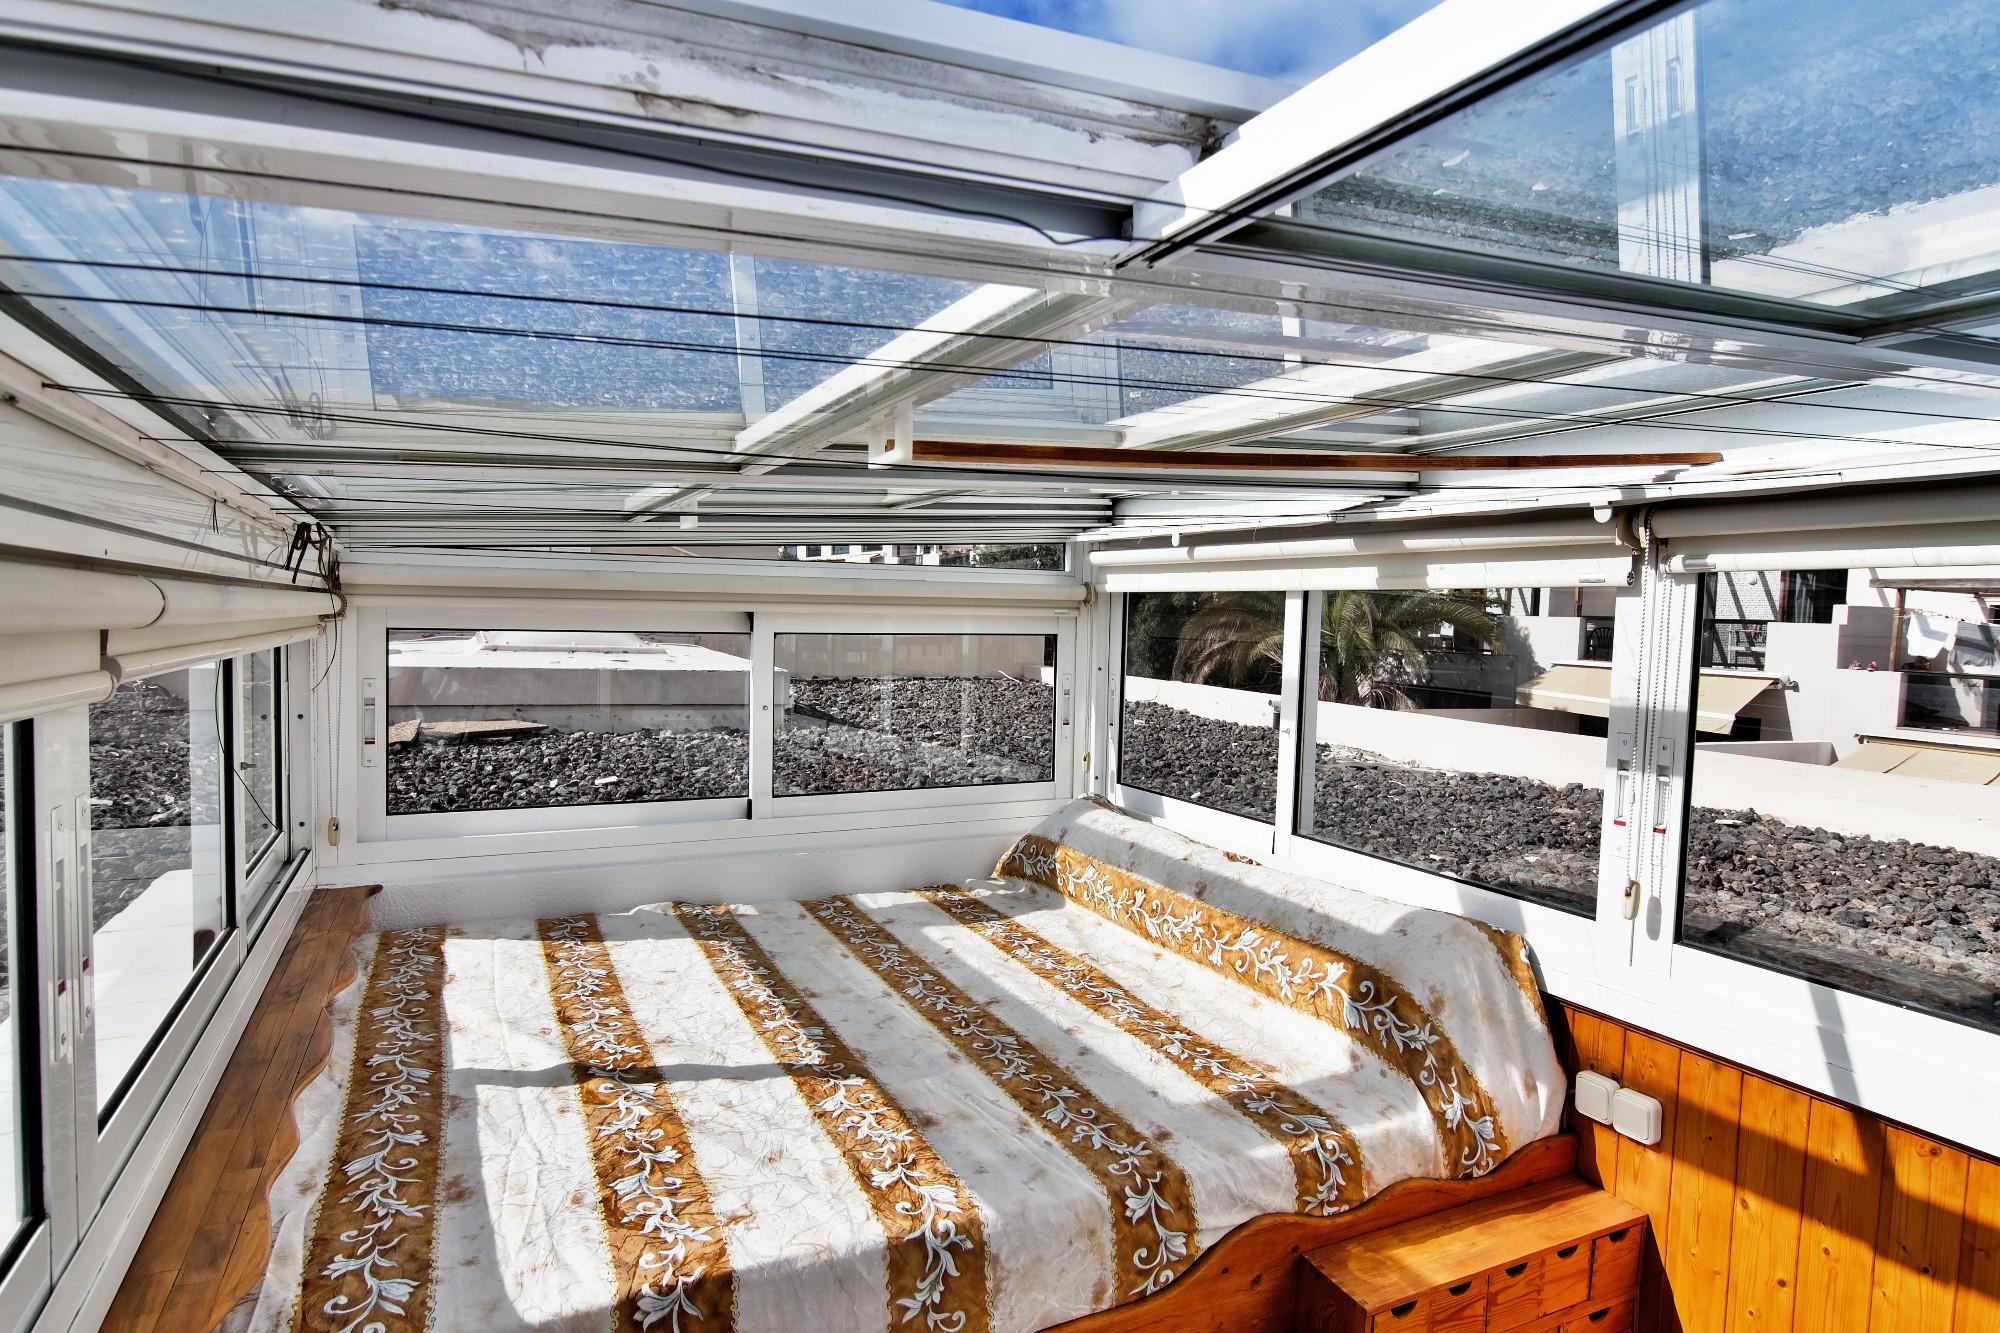 Schlafturm Ferienhaus Adeje Teneriffa